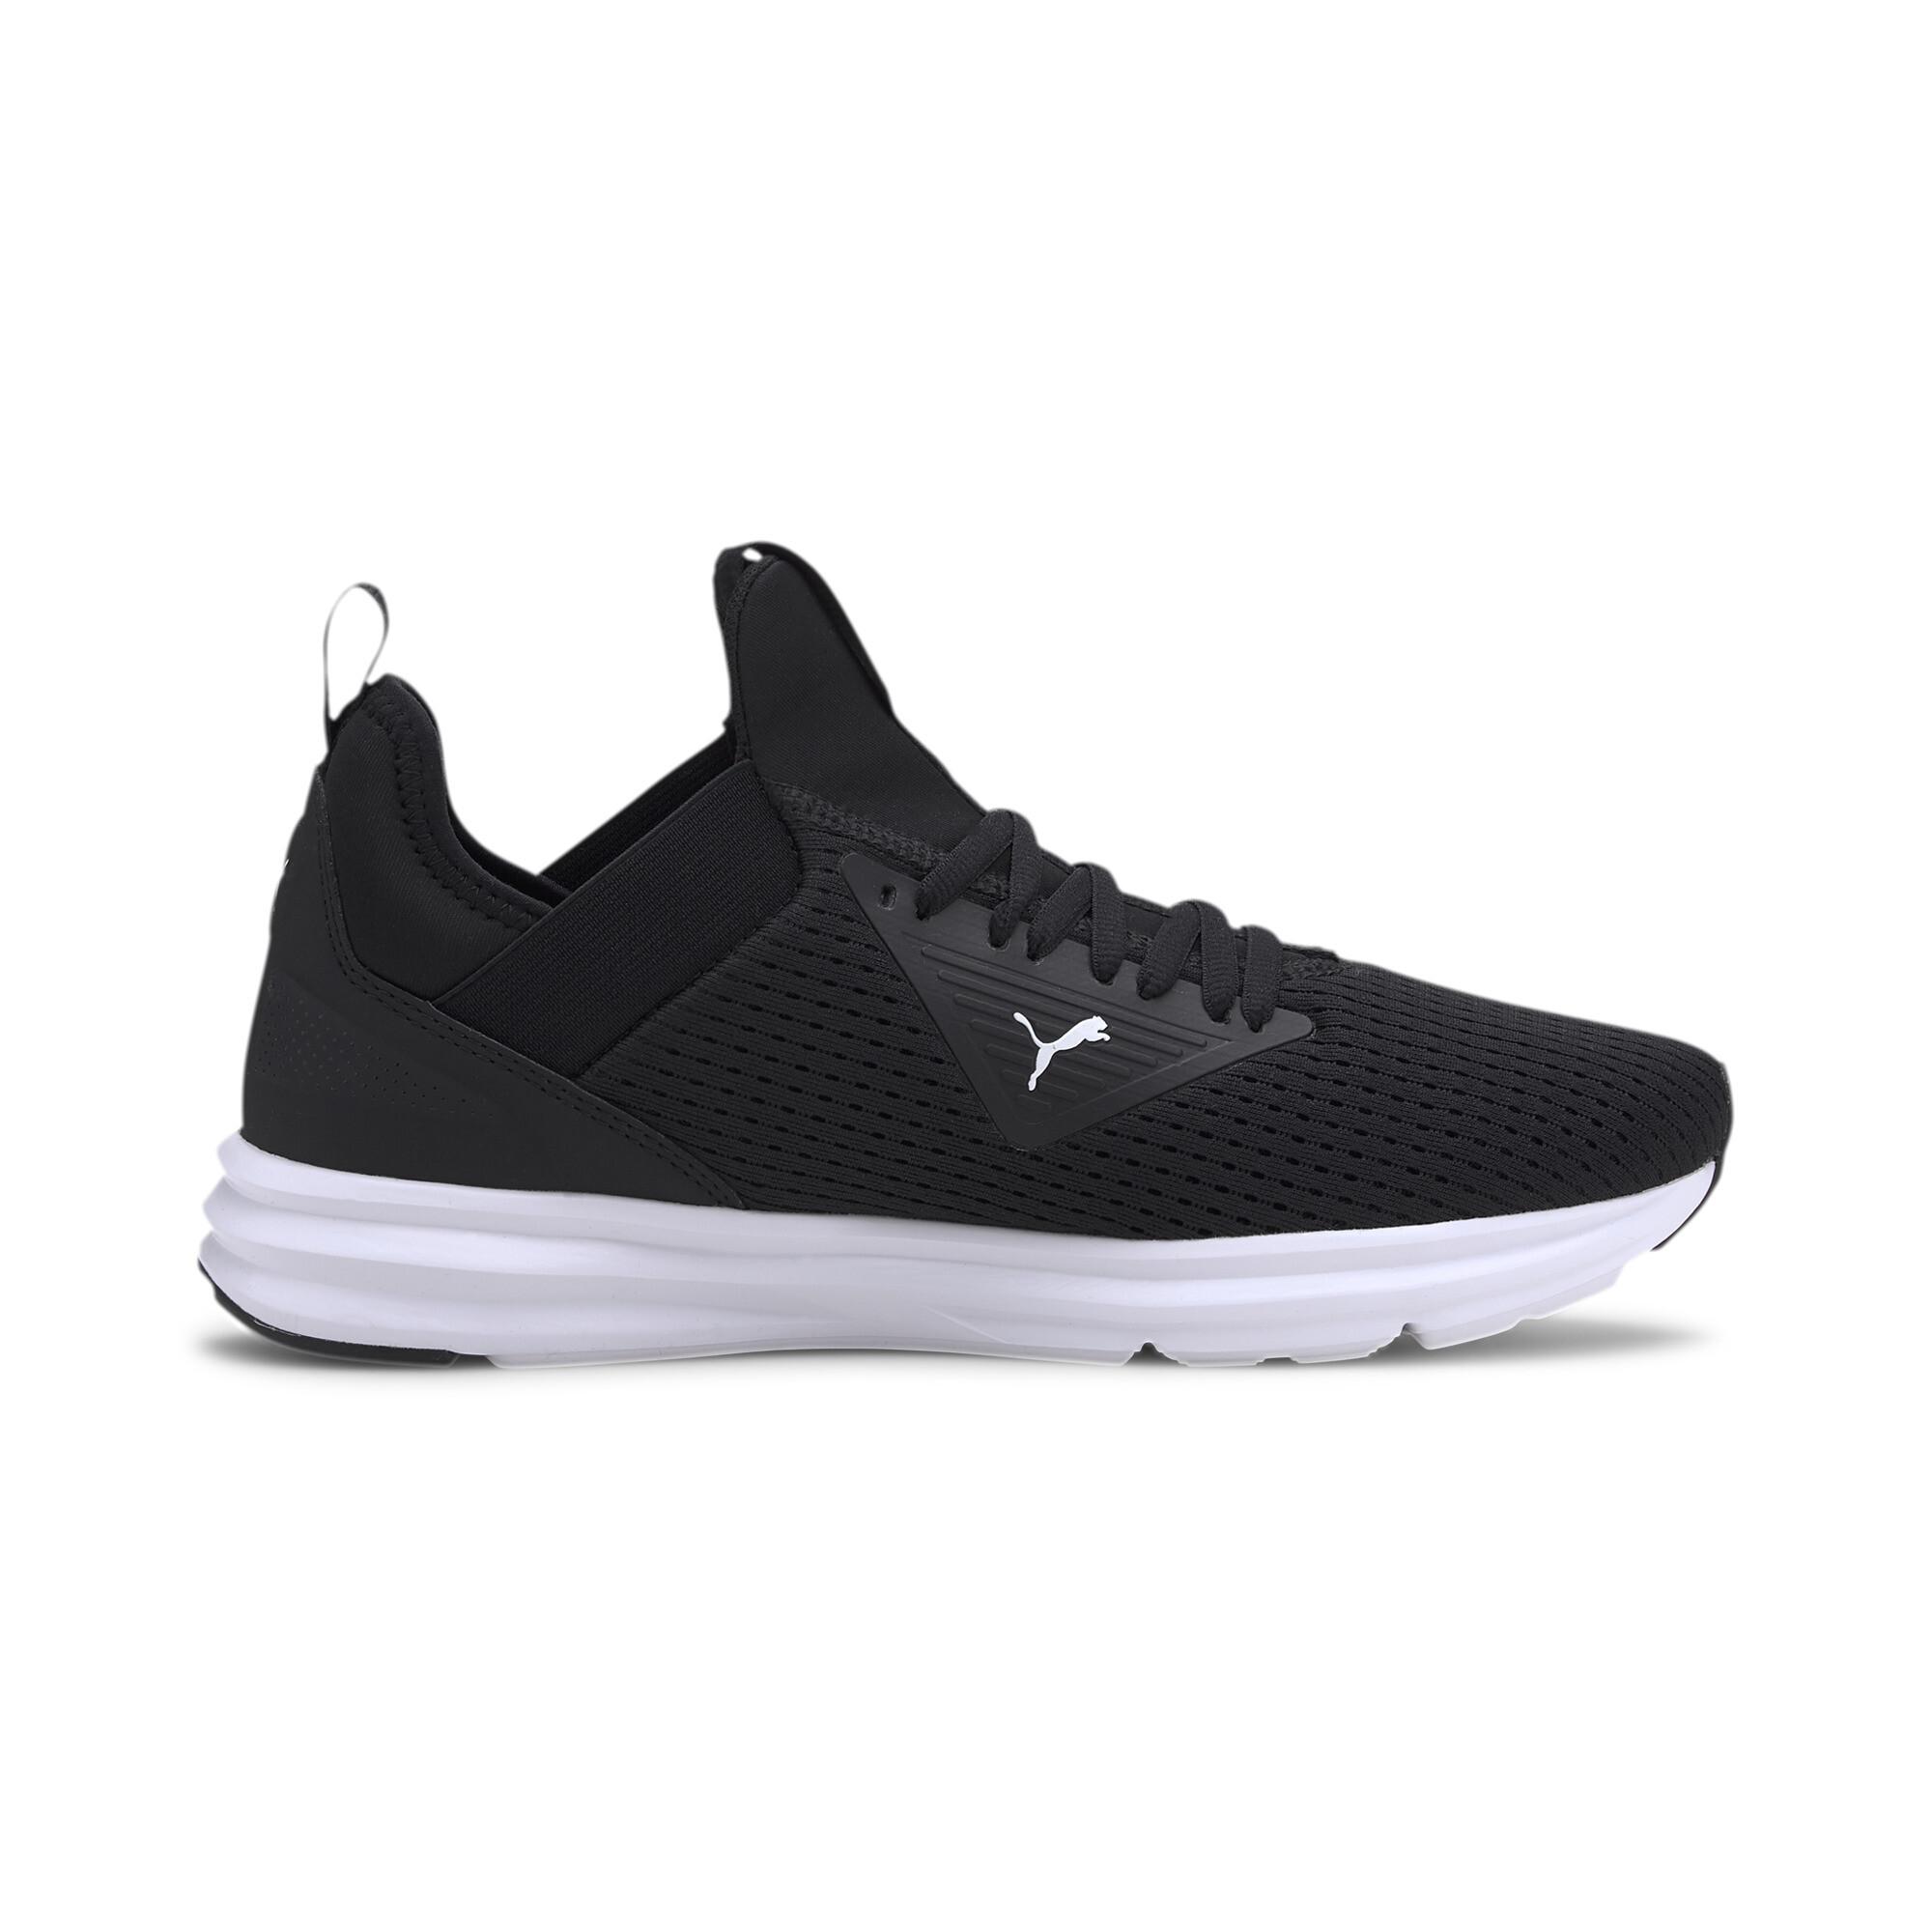 PUMA-Men-039-s-Enzo-Beta-Mesh-Training-Shoes thumbnail 7